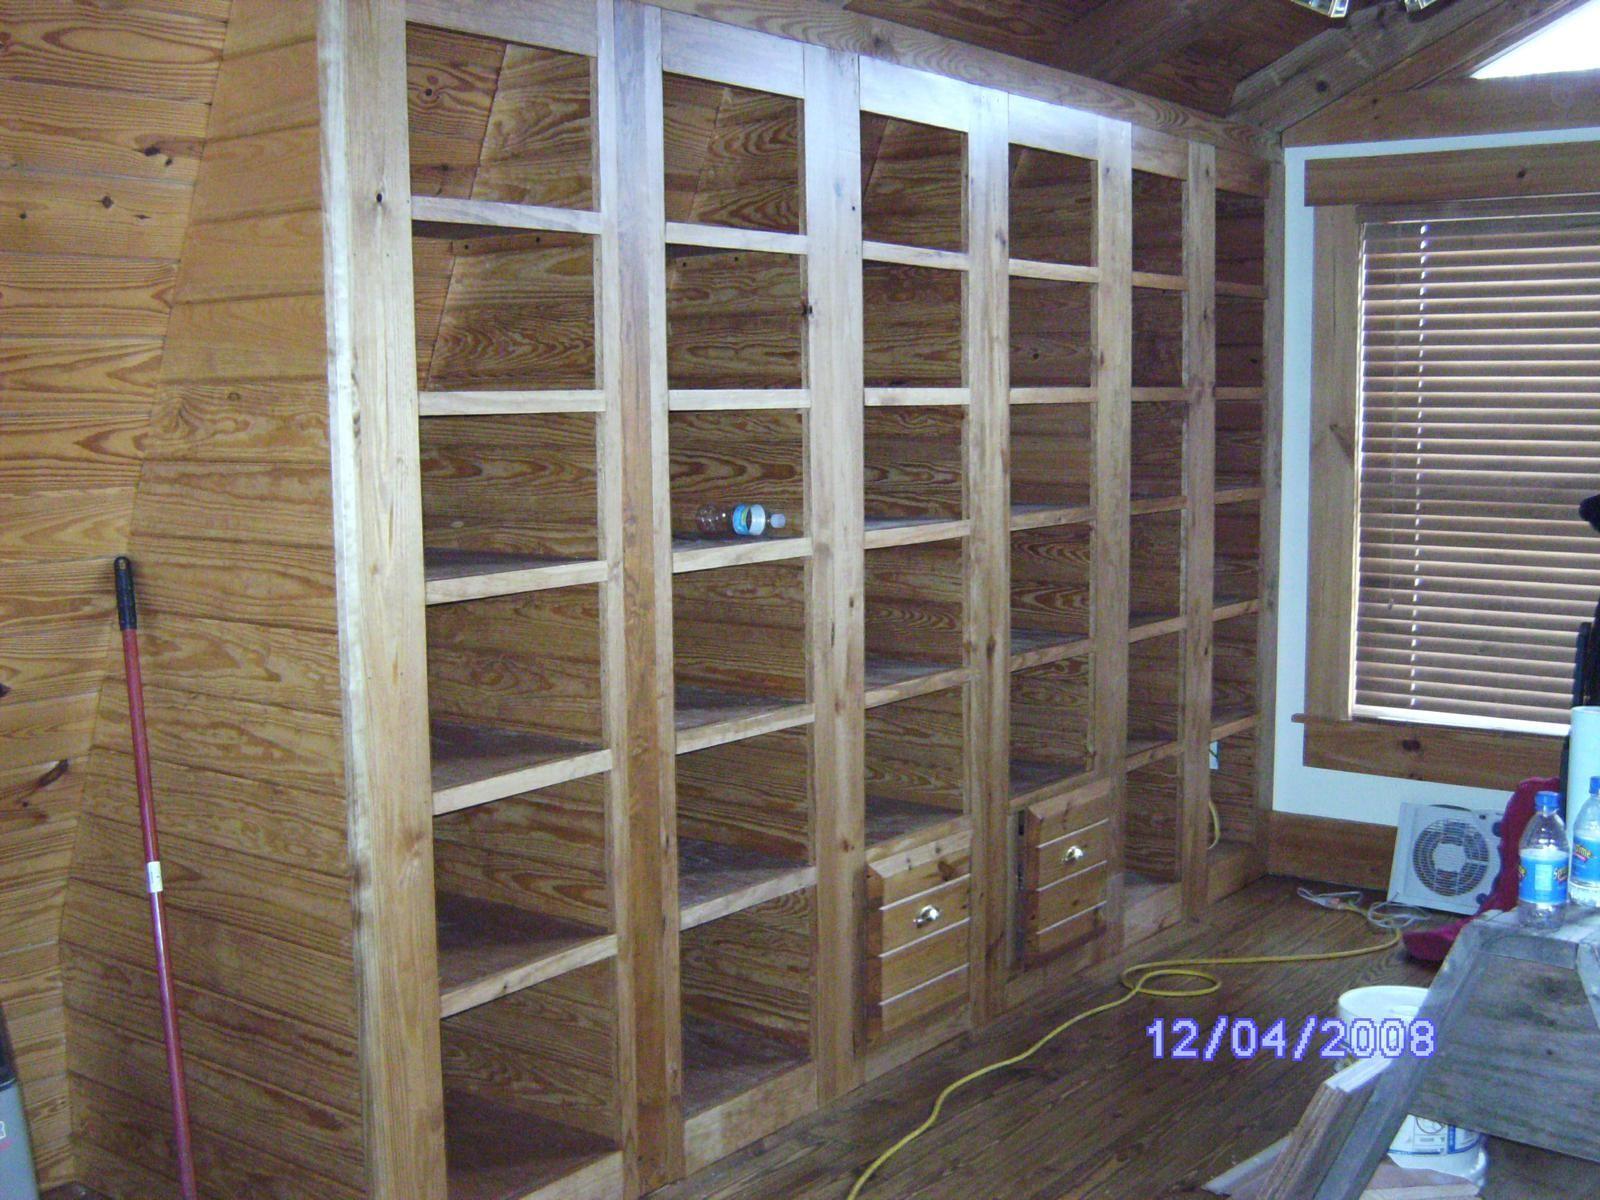 Wooden Cabinets Vintage Built In Filing Cabinets